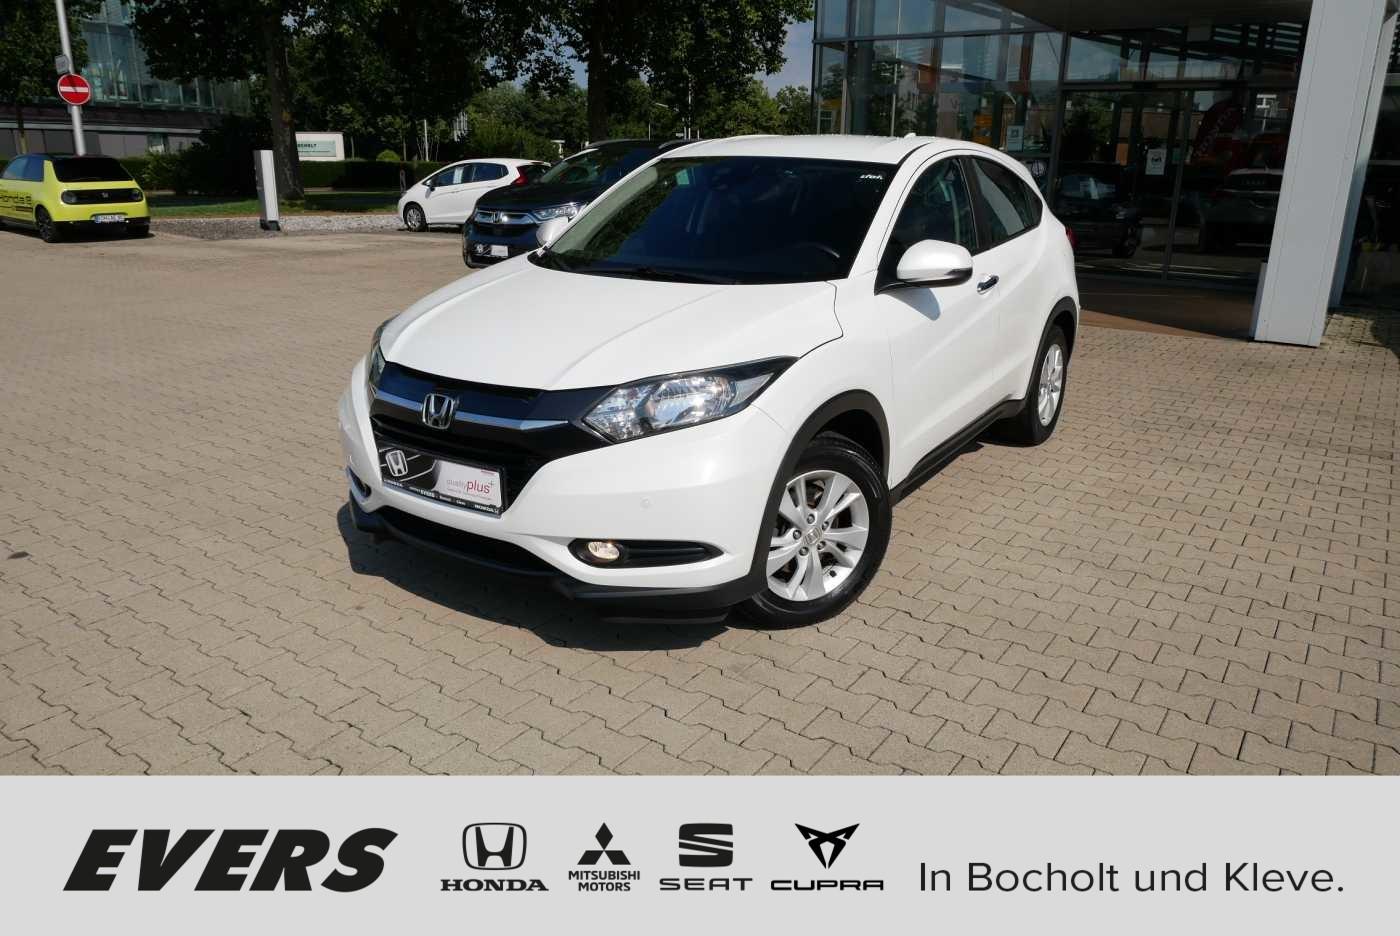 Honda HR-V 1.5 i-VTEC ELEGANCE BLUETOOTH+TEMPOMAT, Jahr 2016, Benzin